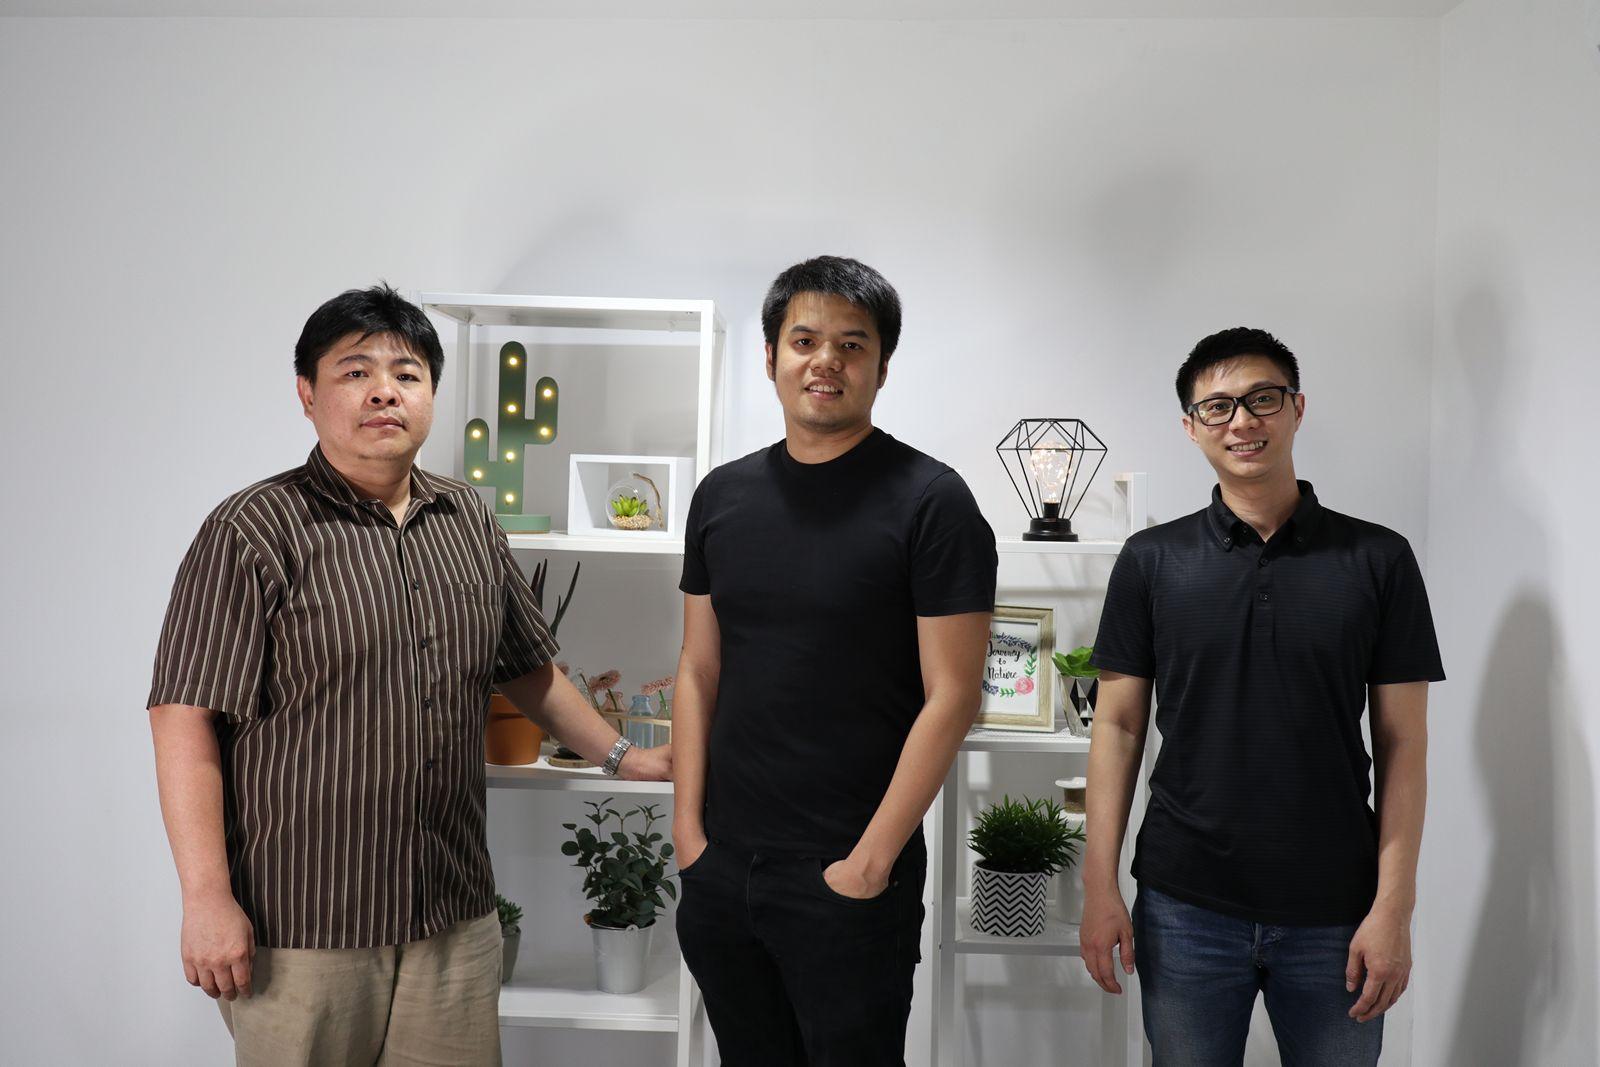 Pictured: William Siawira, Franseda Natalio and Erwin Sujono.